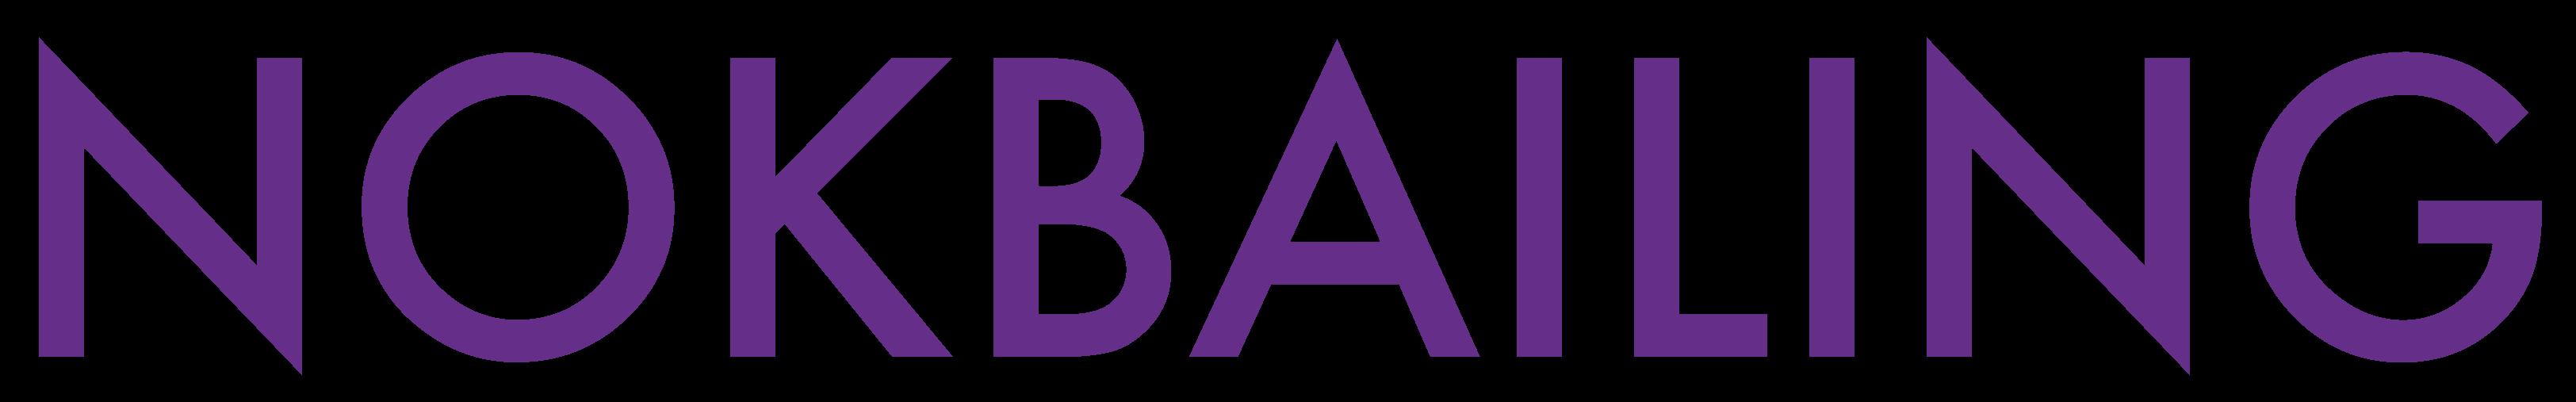 cropped-logo-3-01.png